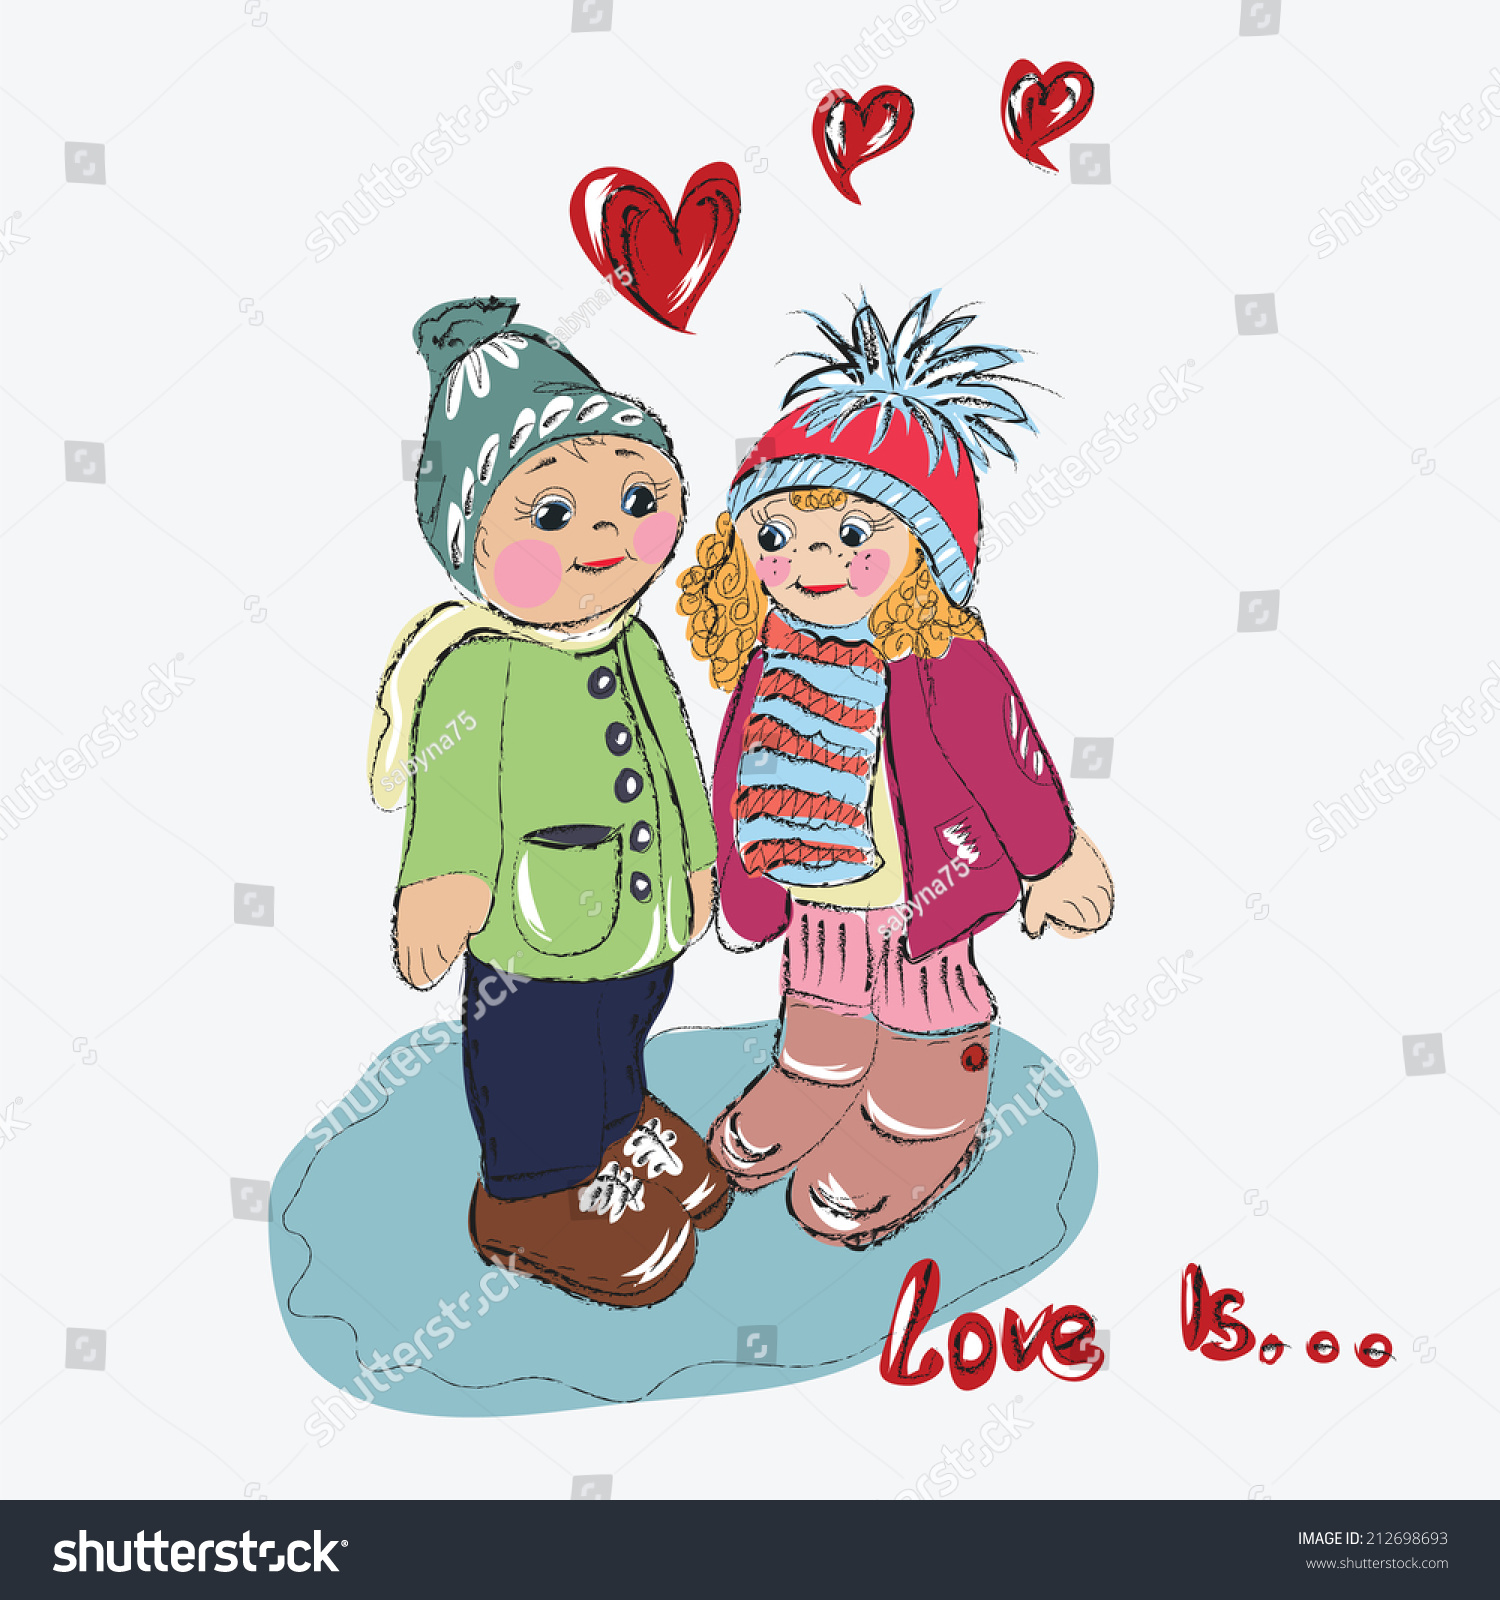 Sketch cartoon couple love boy girl heart